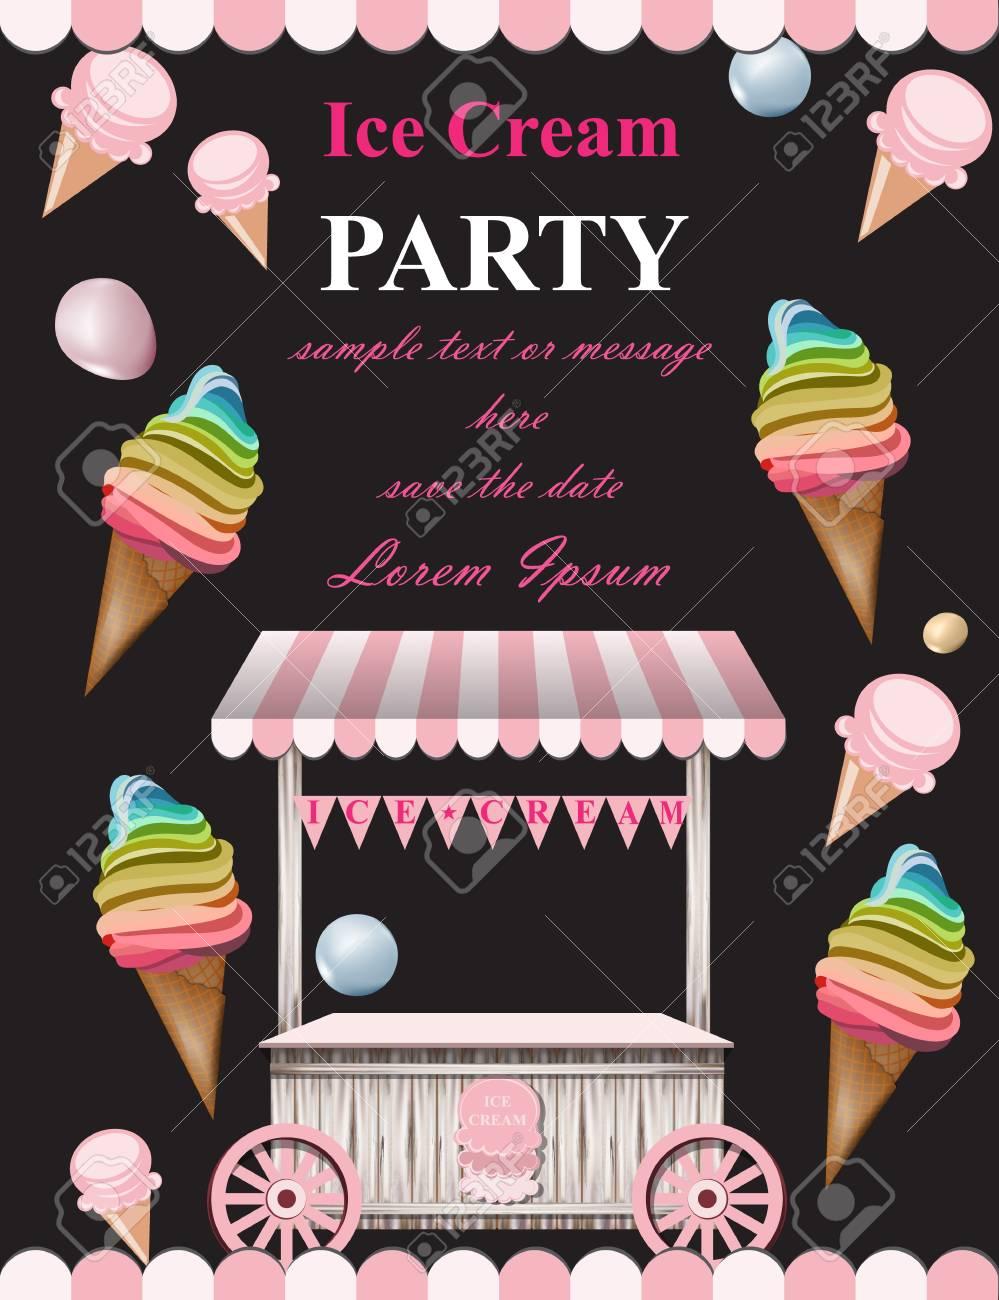 ice cream party invitation card vector summer ice cream booth